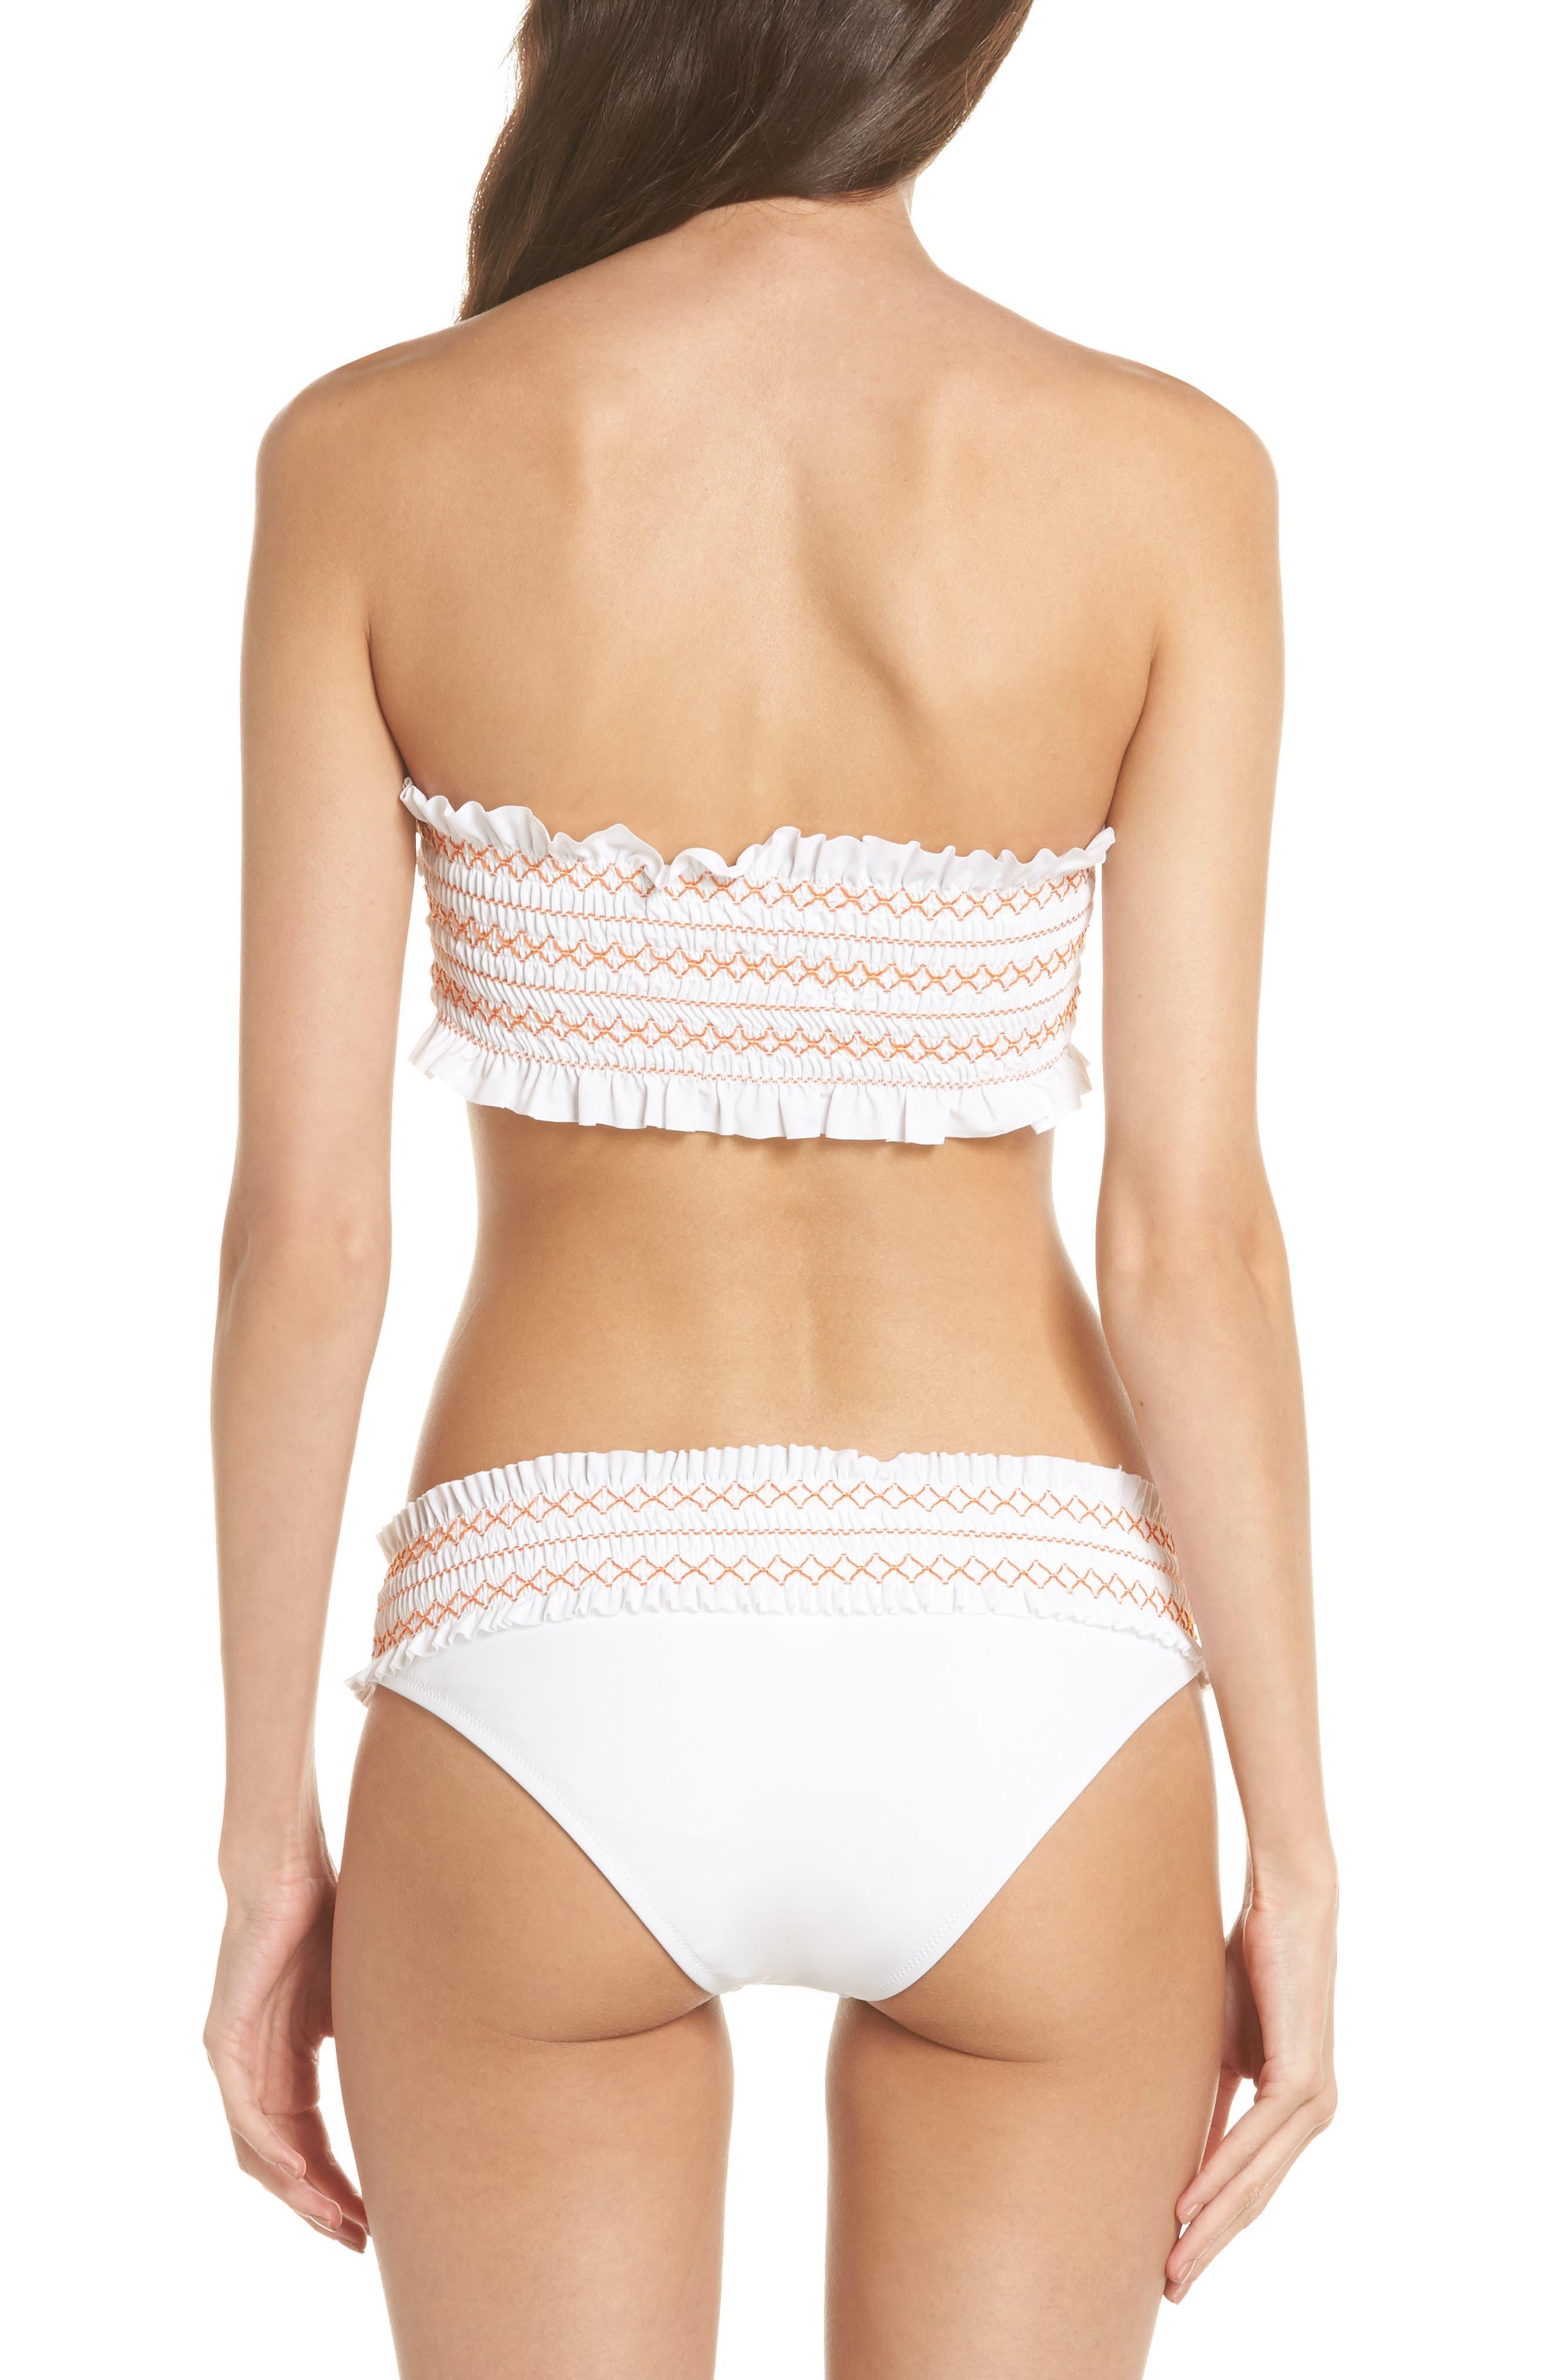 Costa Bandeau Bikini Top,                             Alternate thumbnail 6, color,                             White/ Fresh Melon